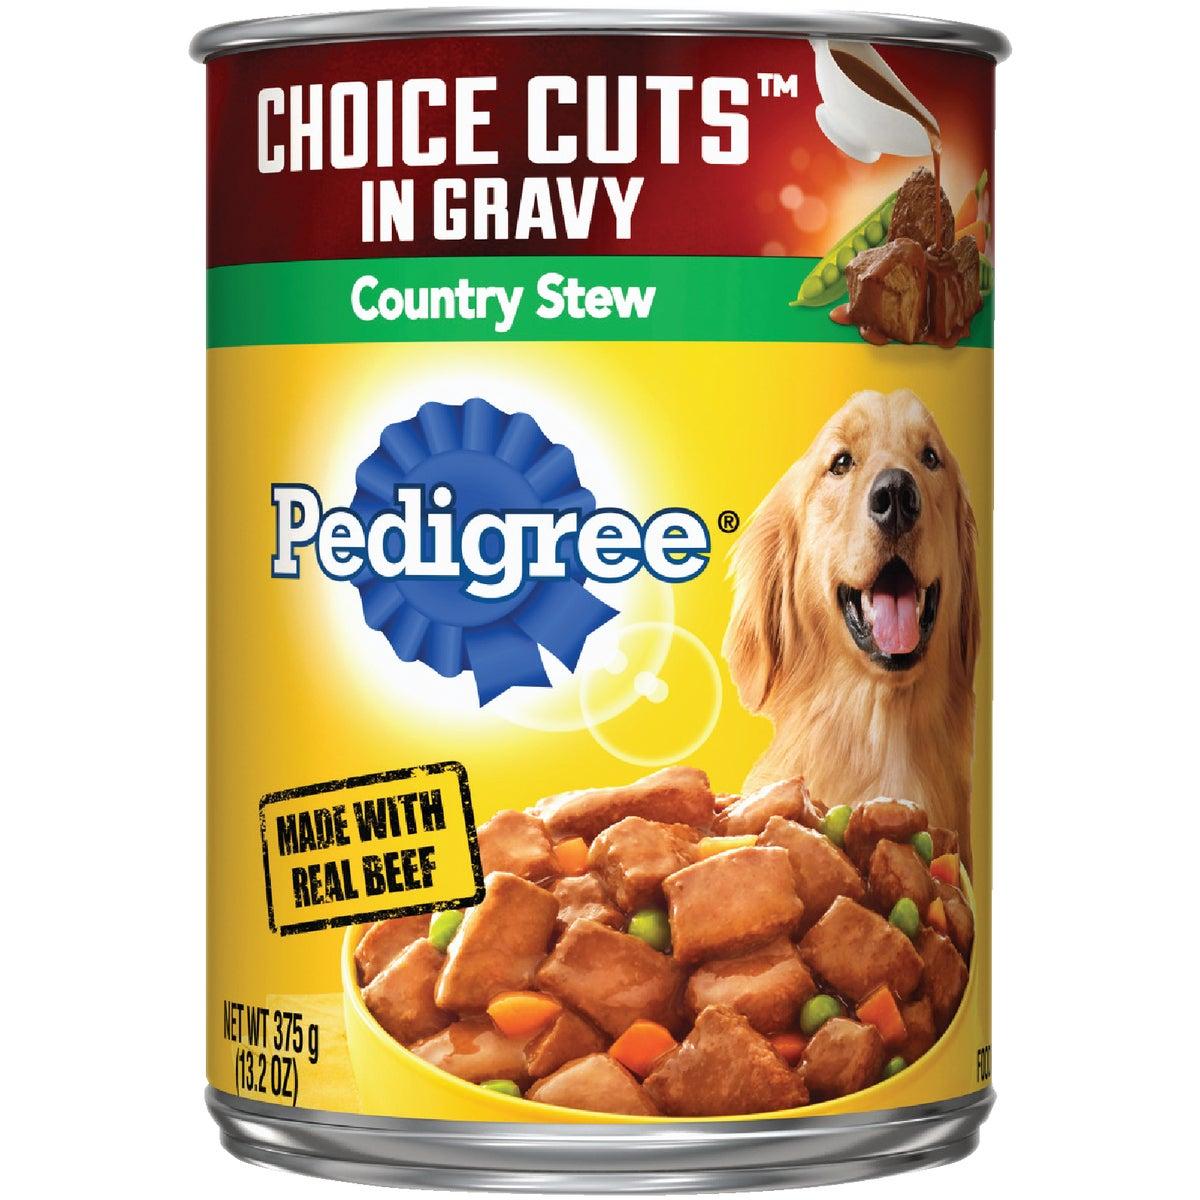 13OZ CNTRY STEW DOG FOOD - 01508 by Mars Pedigree